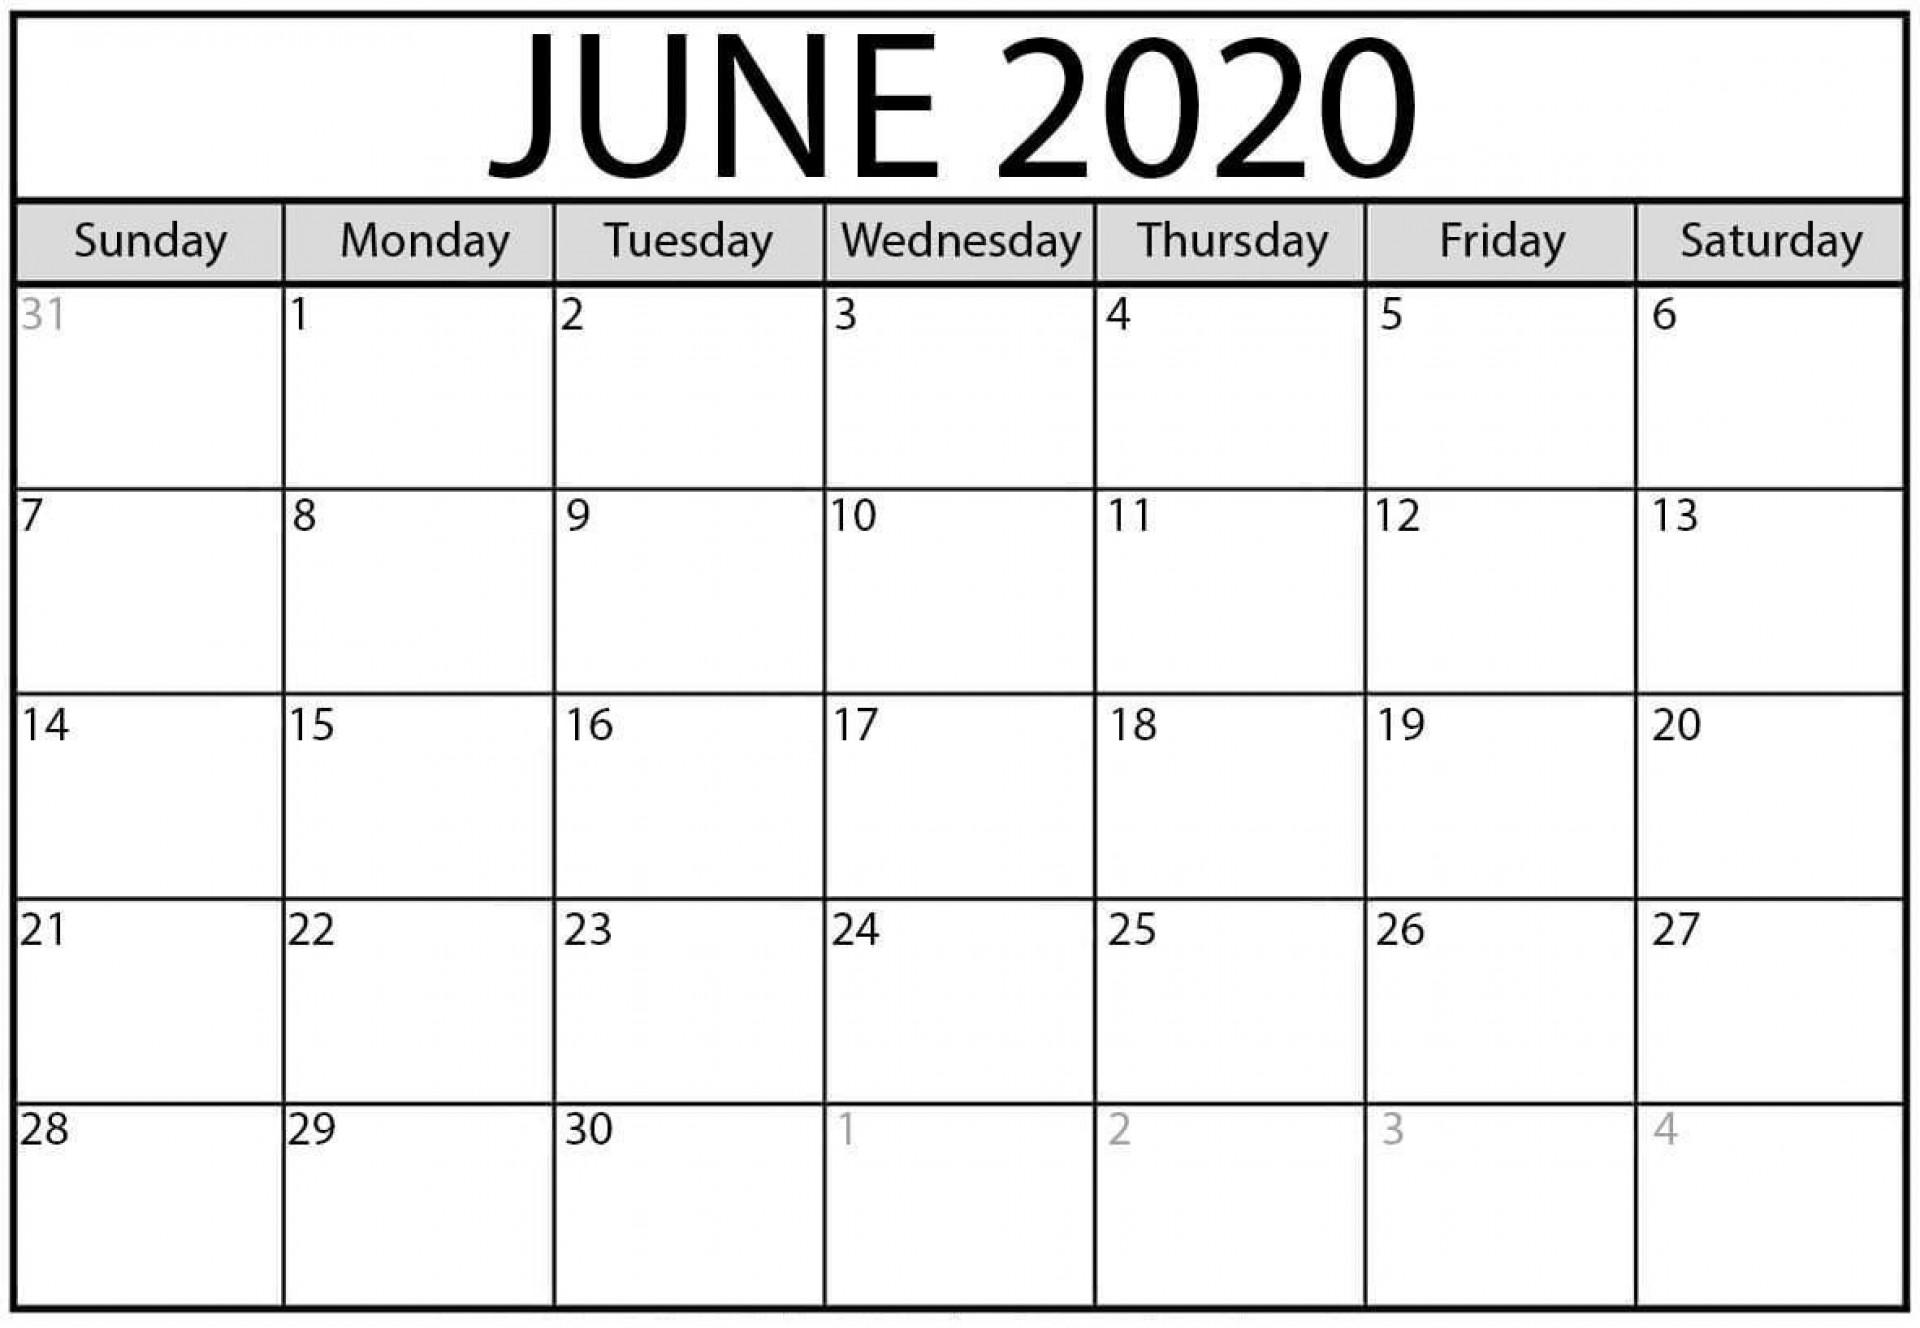 009 Breathtaking June 2020 Monthly Calendar Template Inspiration 1920